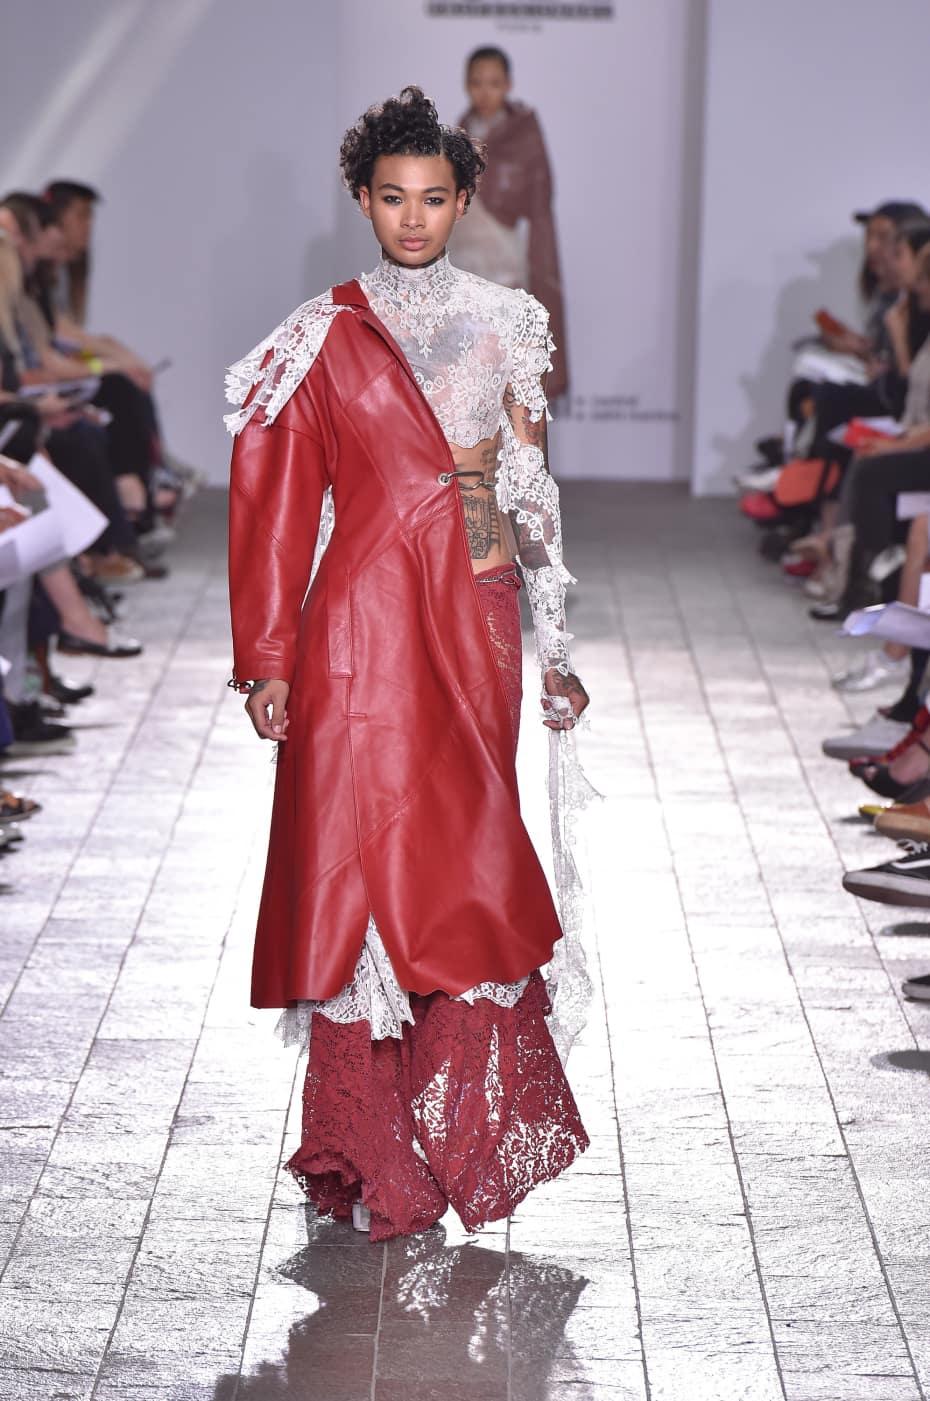 BA (Hons) Fashion: Fashion Design Womenswear